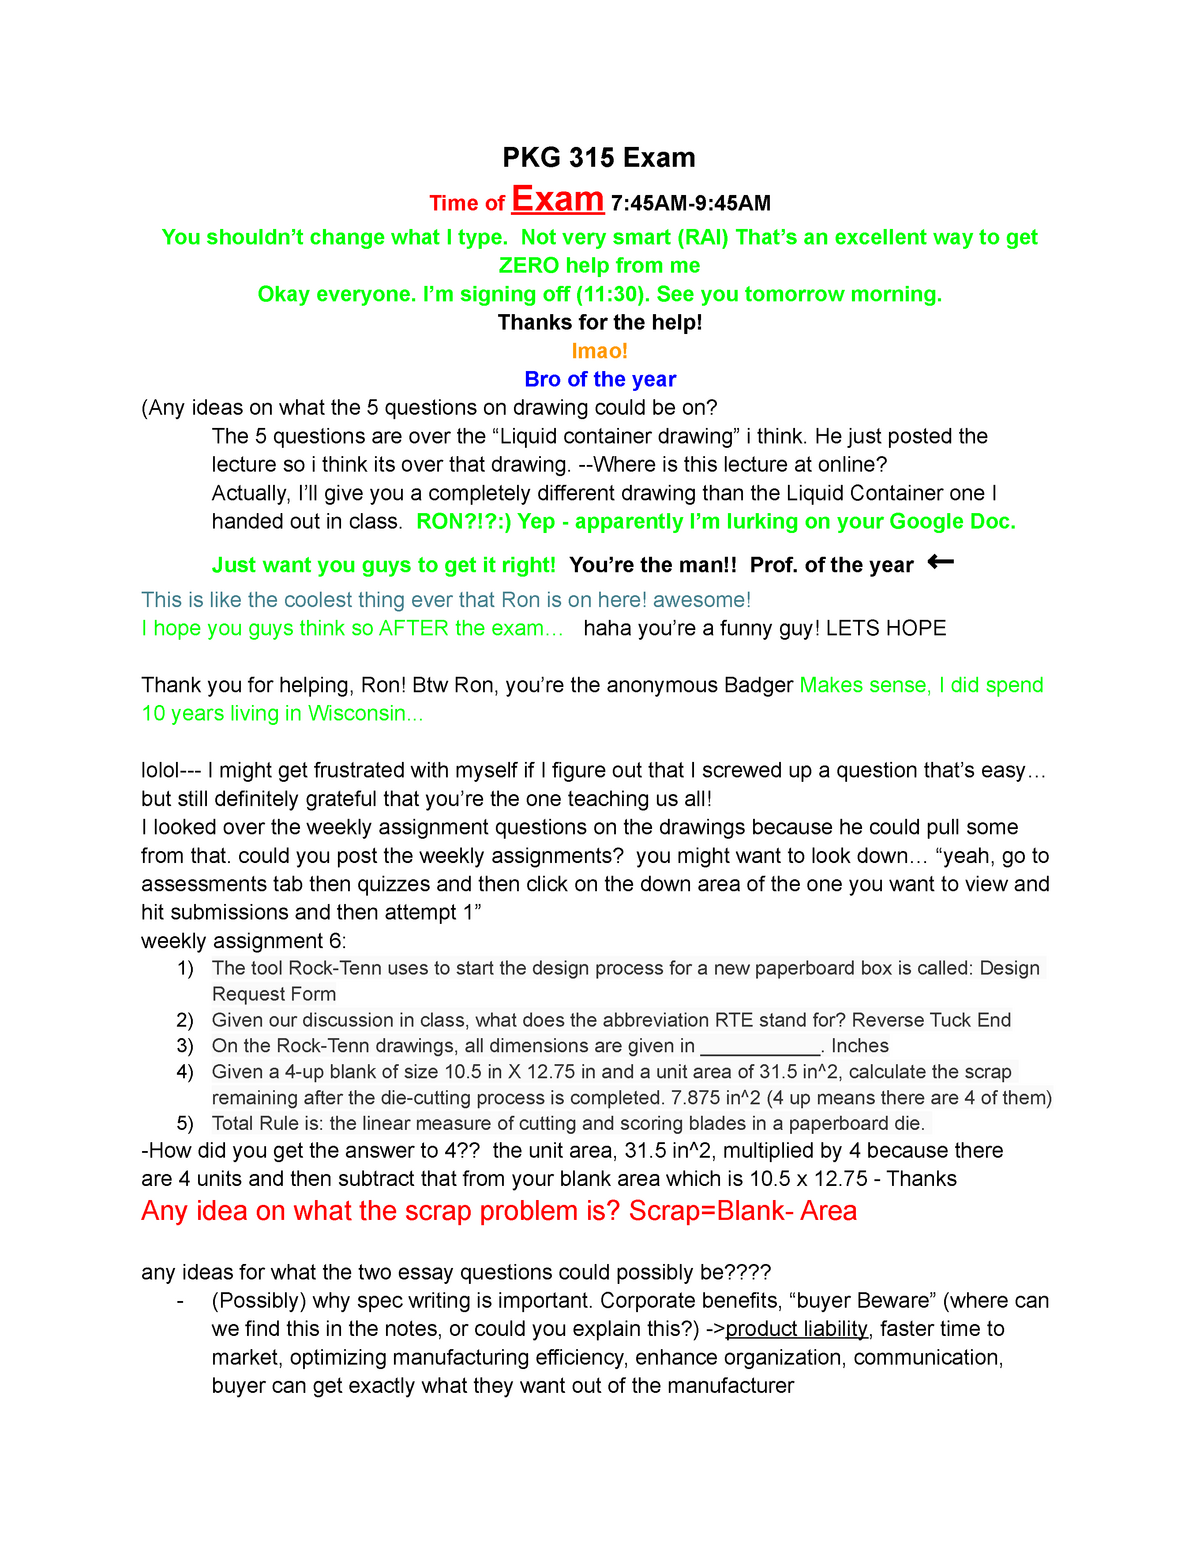 Tutorial work - final exam study guide - PKG 315: Packaging